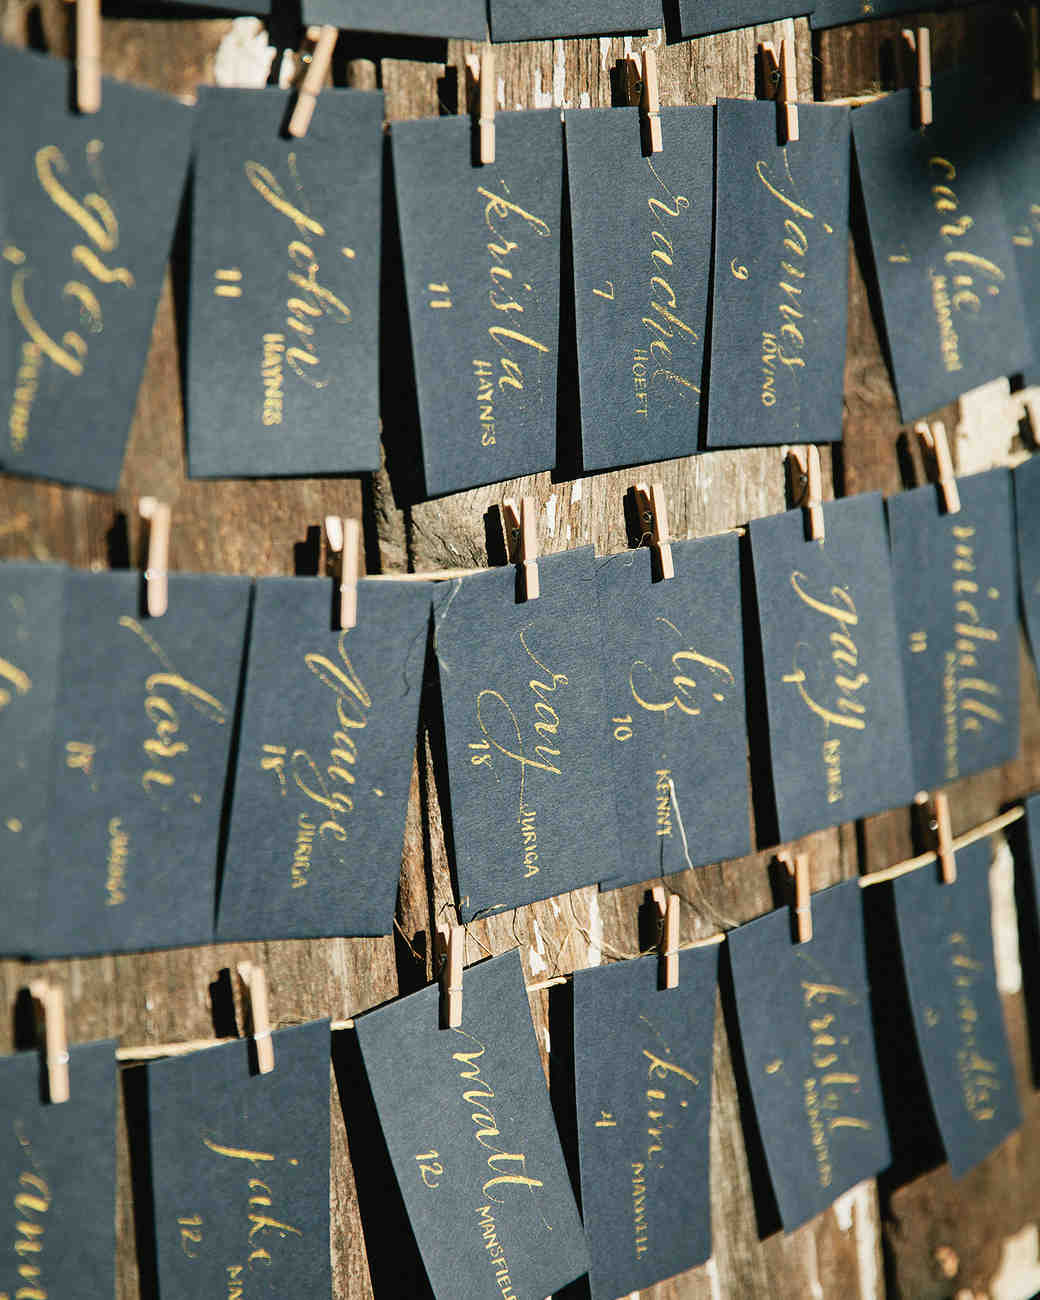 jesse-nate-wedding-escortcards-0562-s113063-0716.jpg